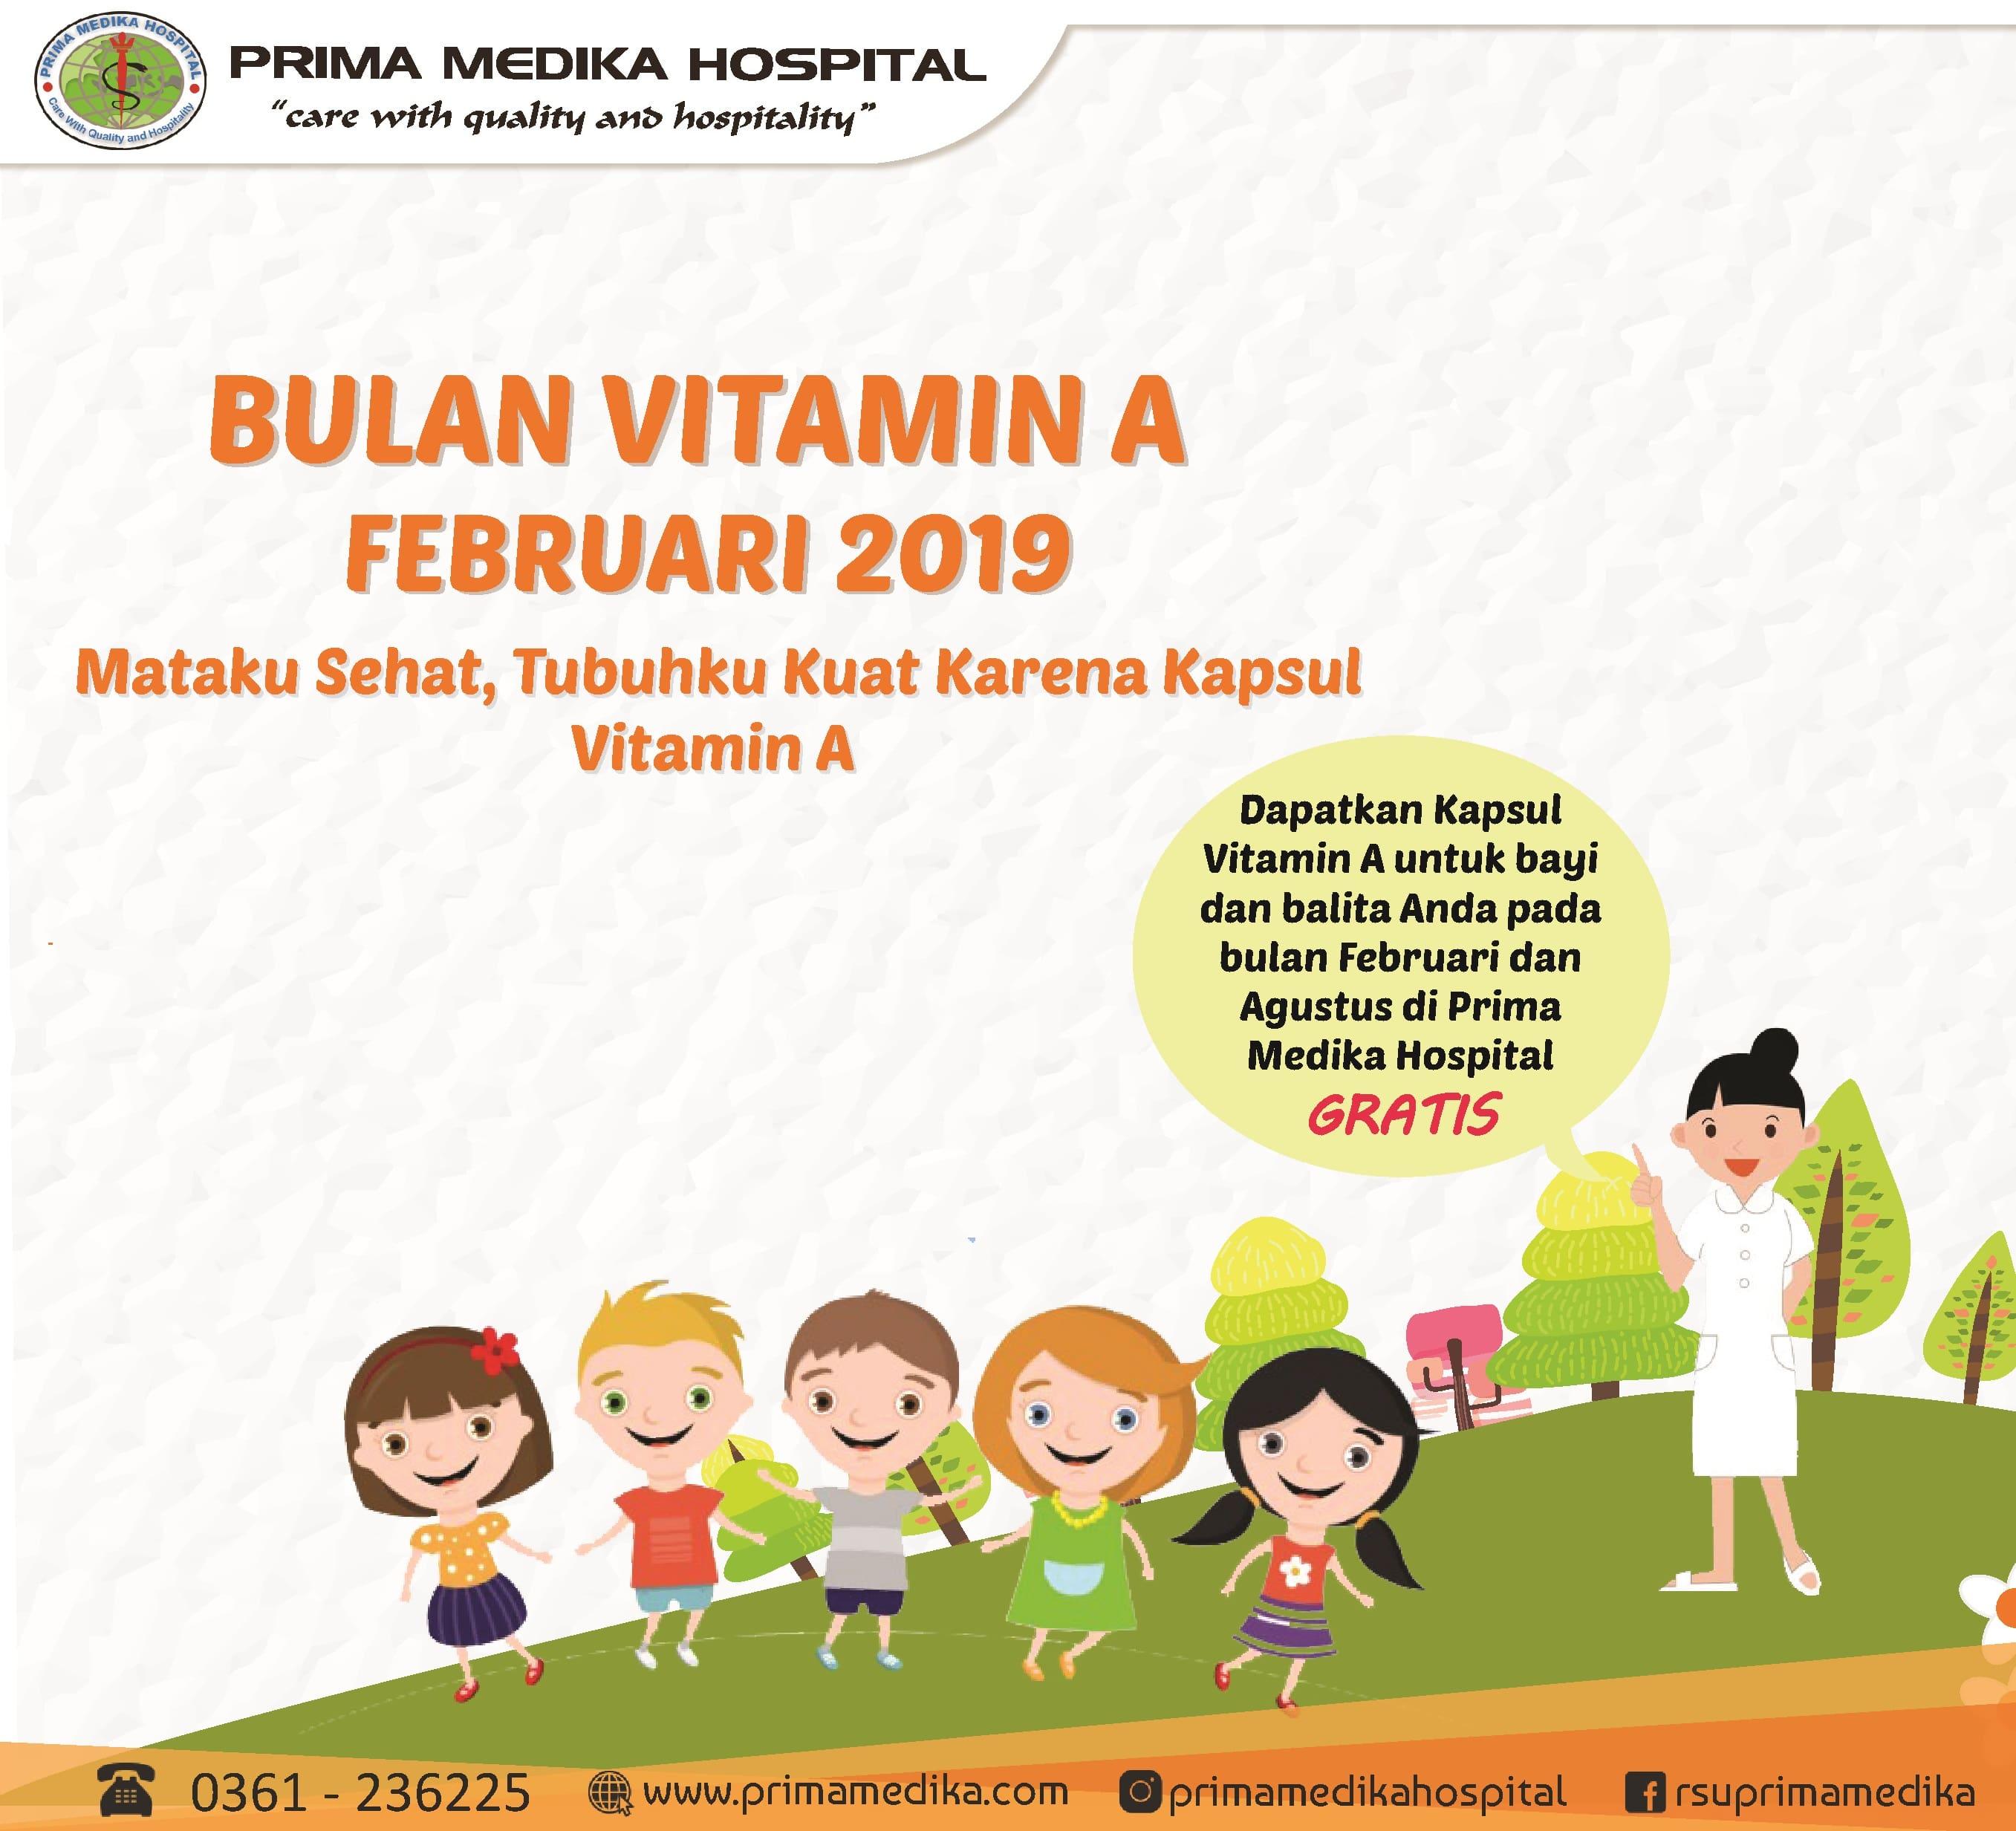 Menyambut Bulan Vitamin A, yuk datang Ke Prima Medika  !